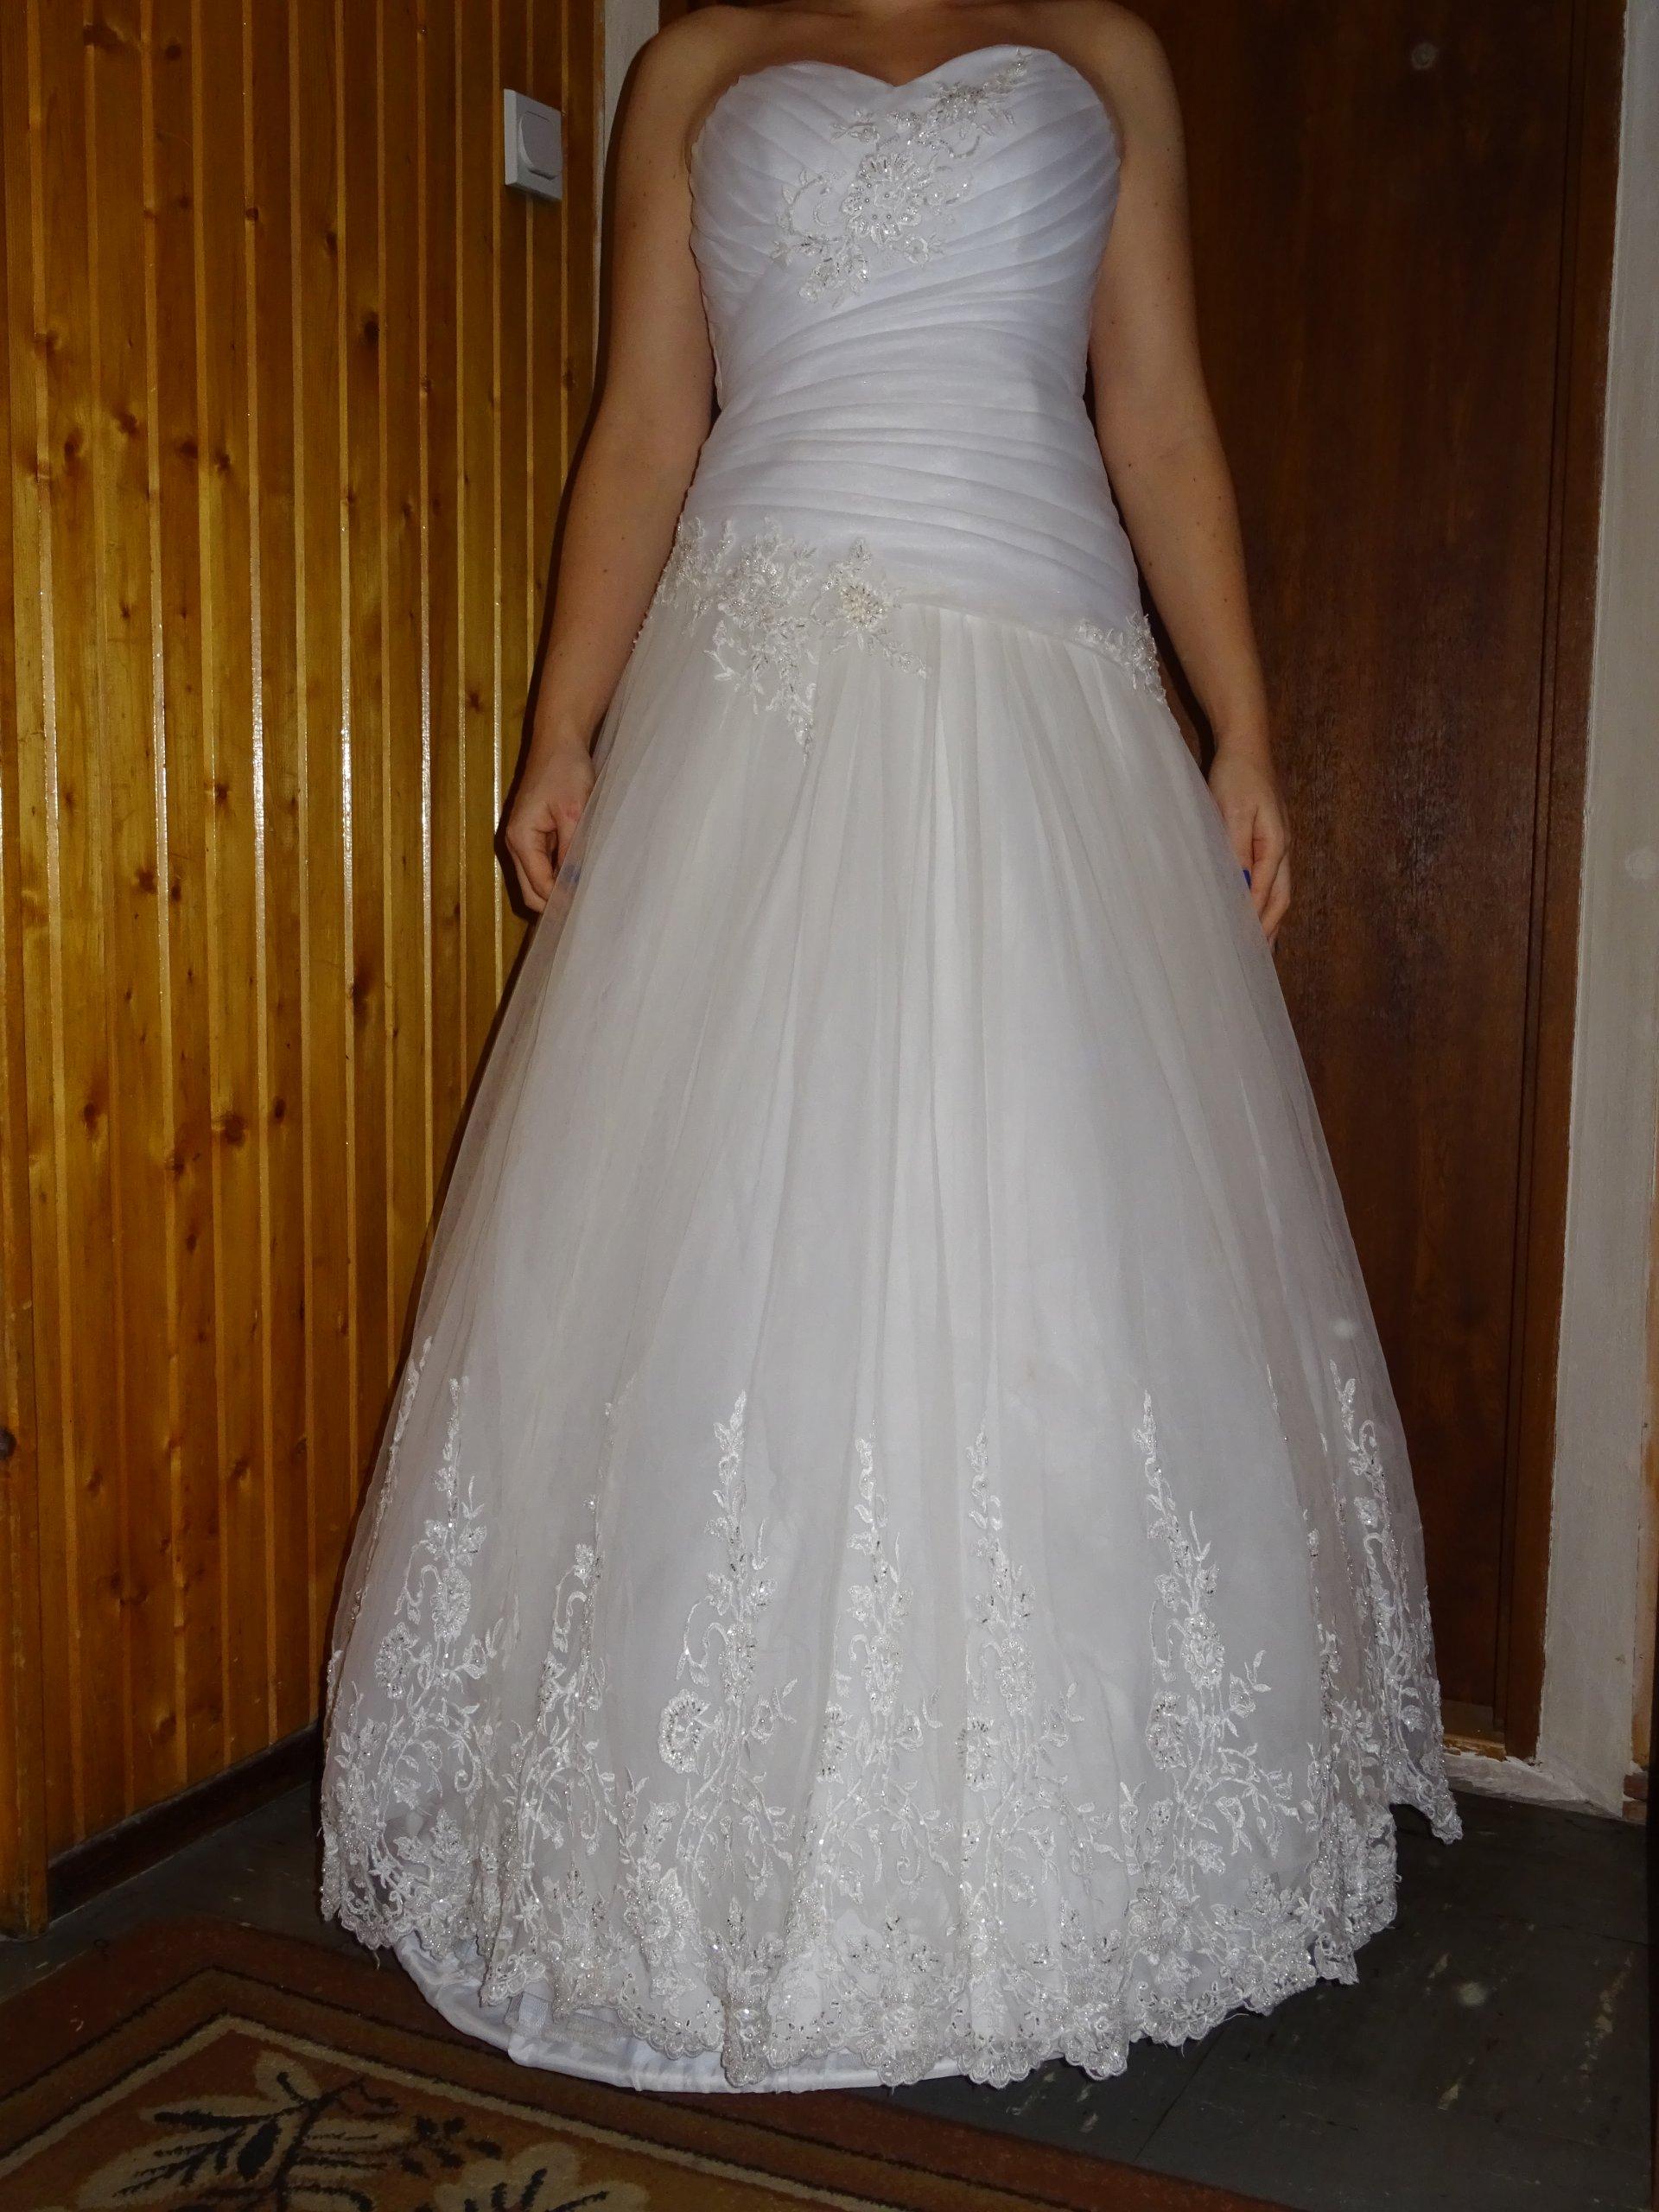 Suknia ślubna Agora Elle Rozmiar 38 7242513429 Oficjalne